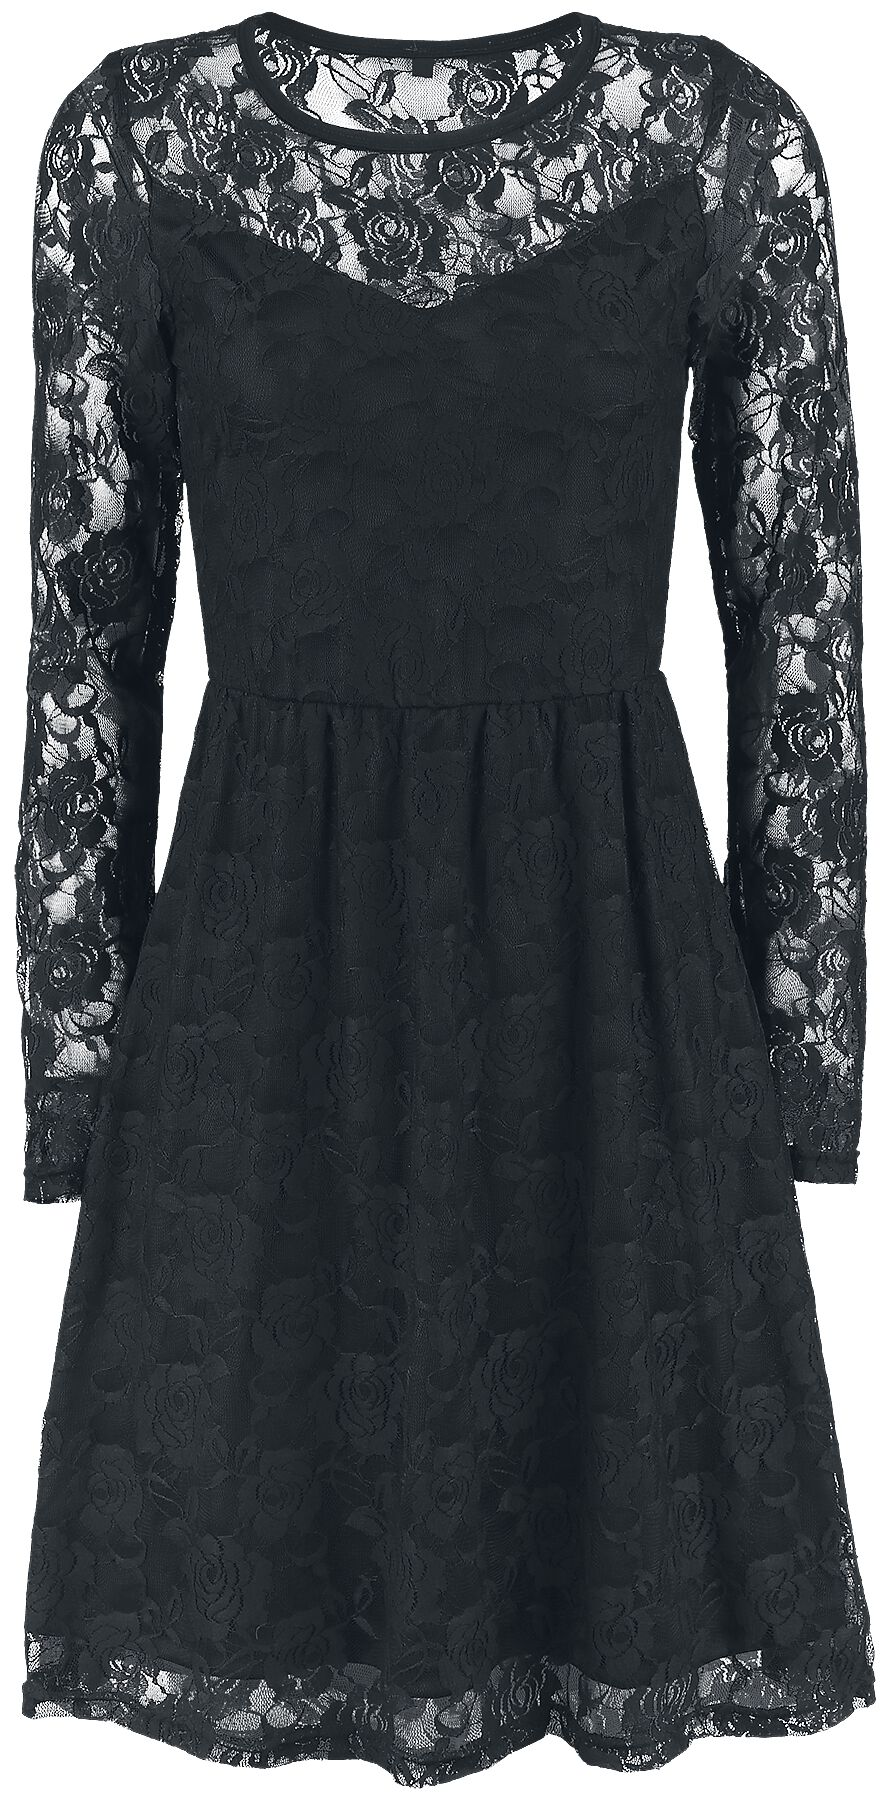 Image of   Forplay Lace Dress Kjole sort